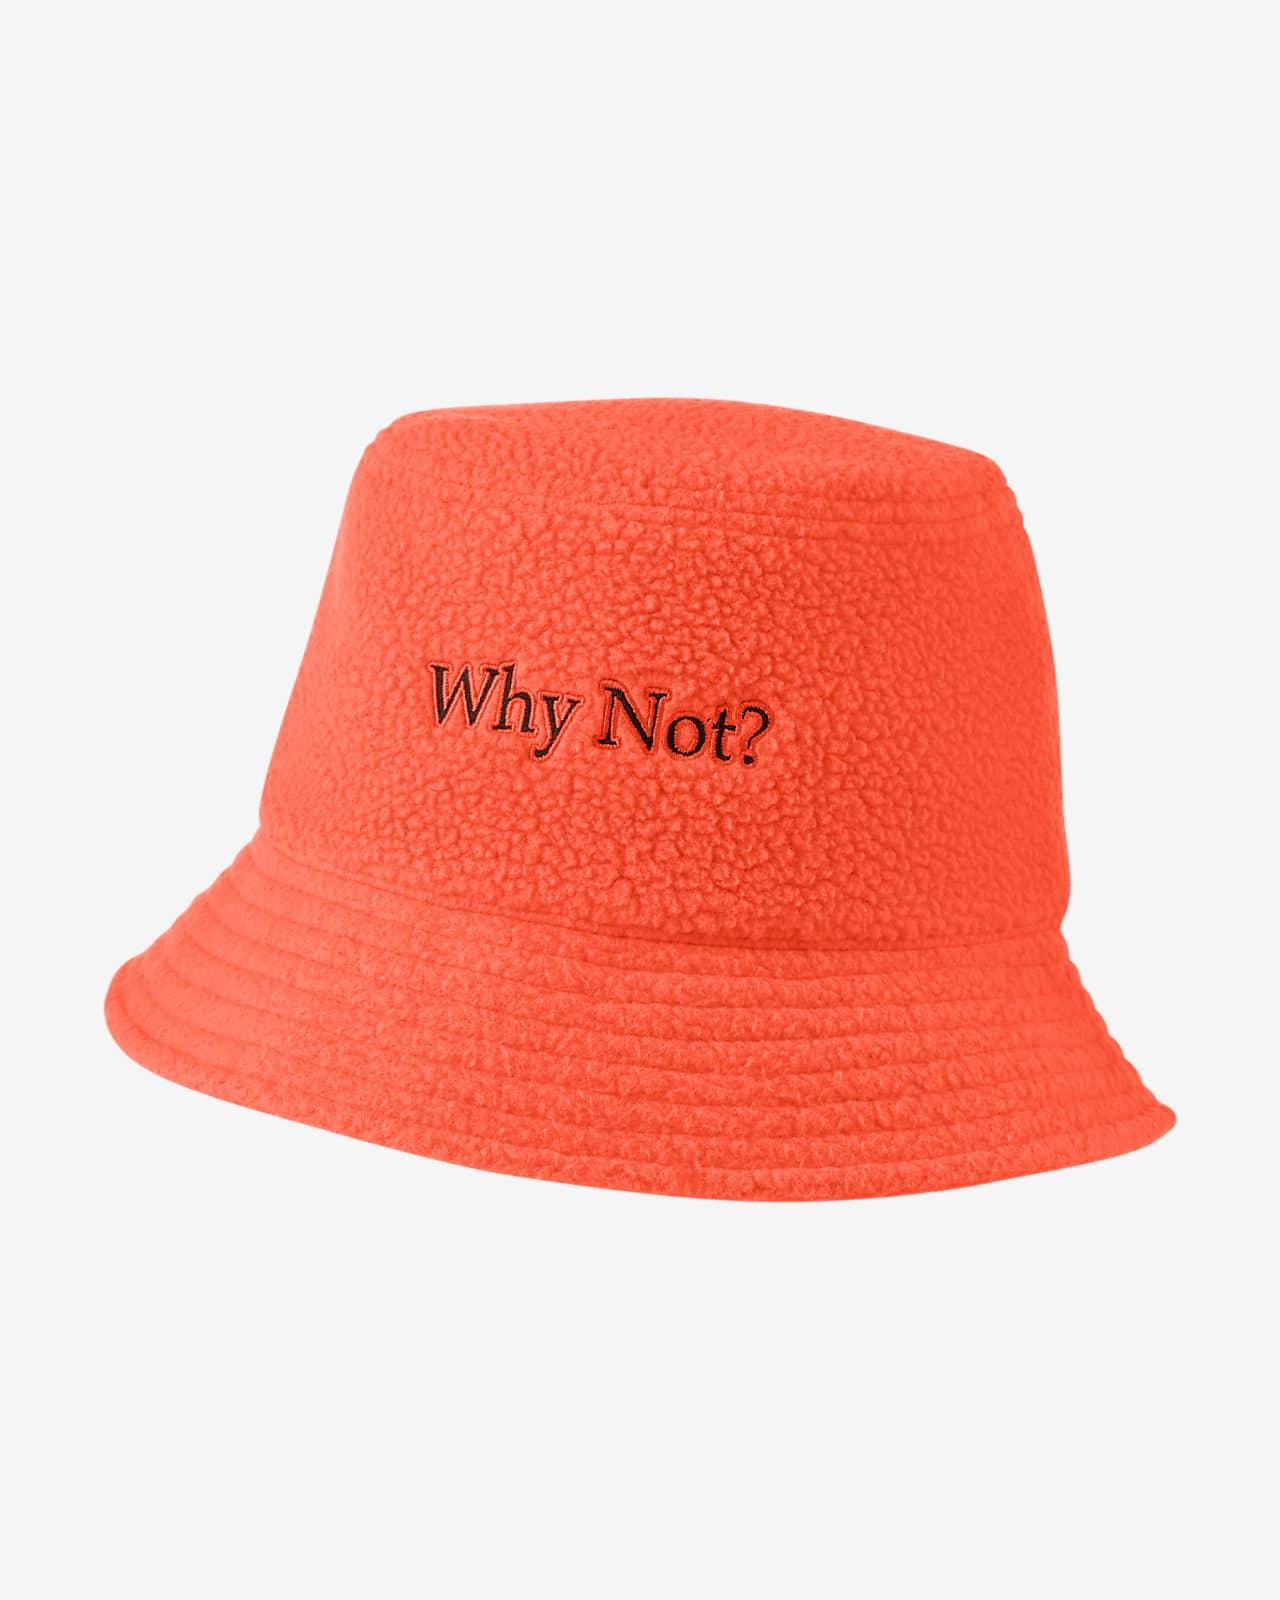 Jordan 'Why Not?'Bucket Hat